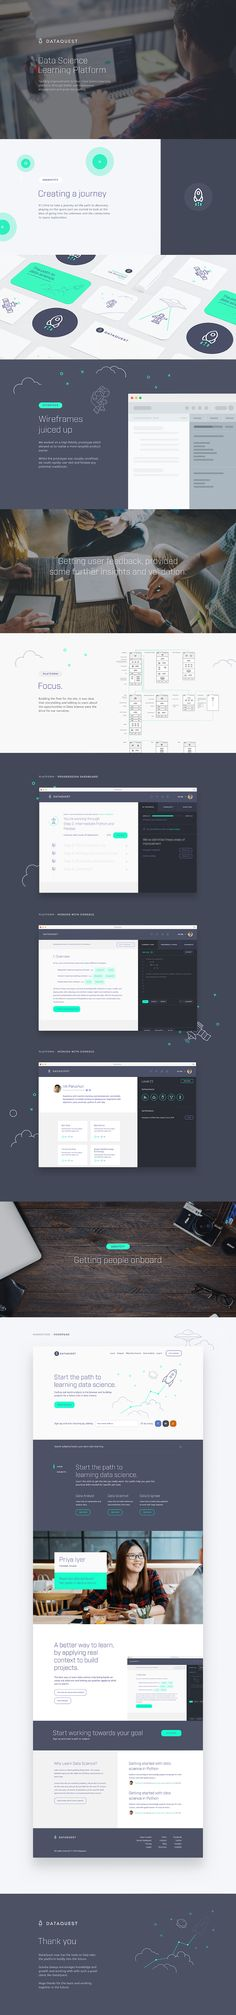 DataQuest - Data Science Learning Platform Branding UI/UX Web Design